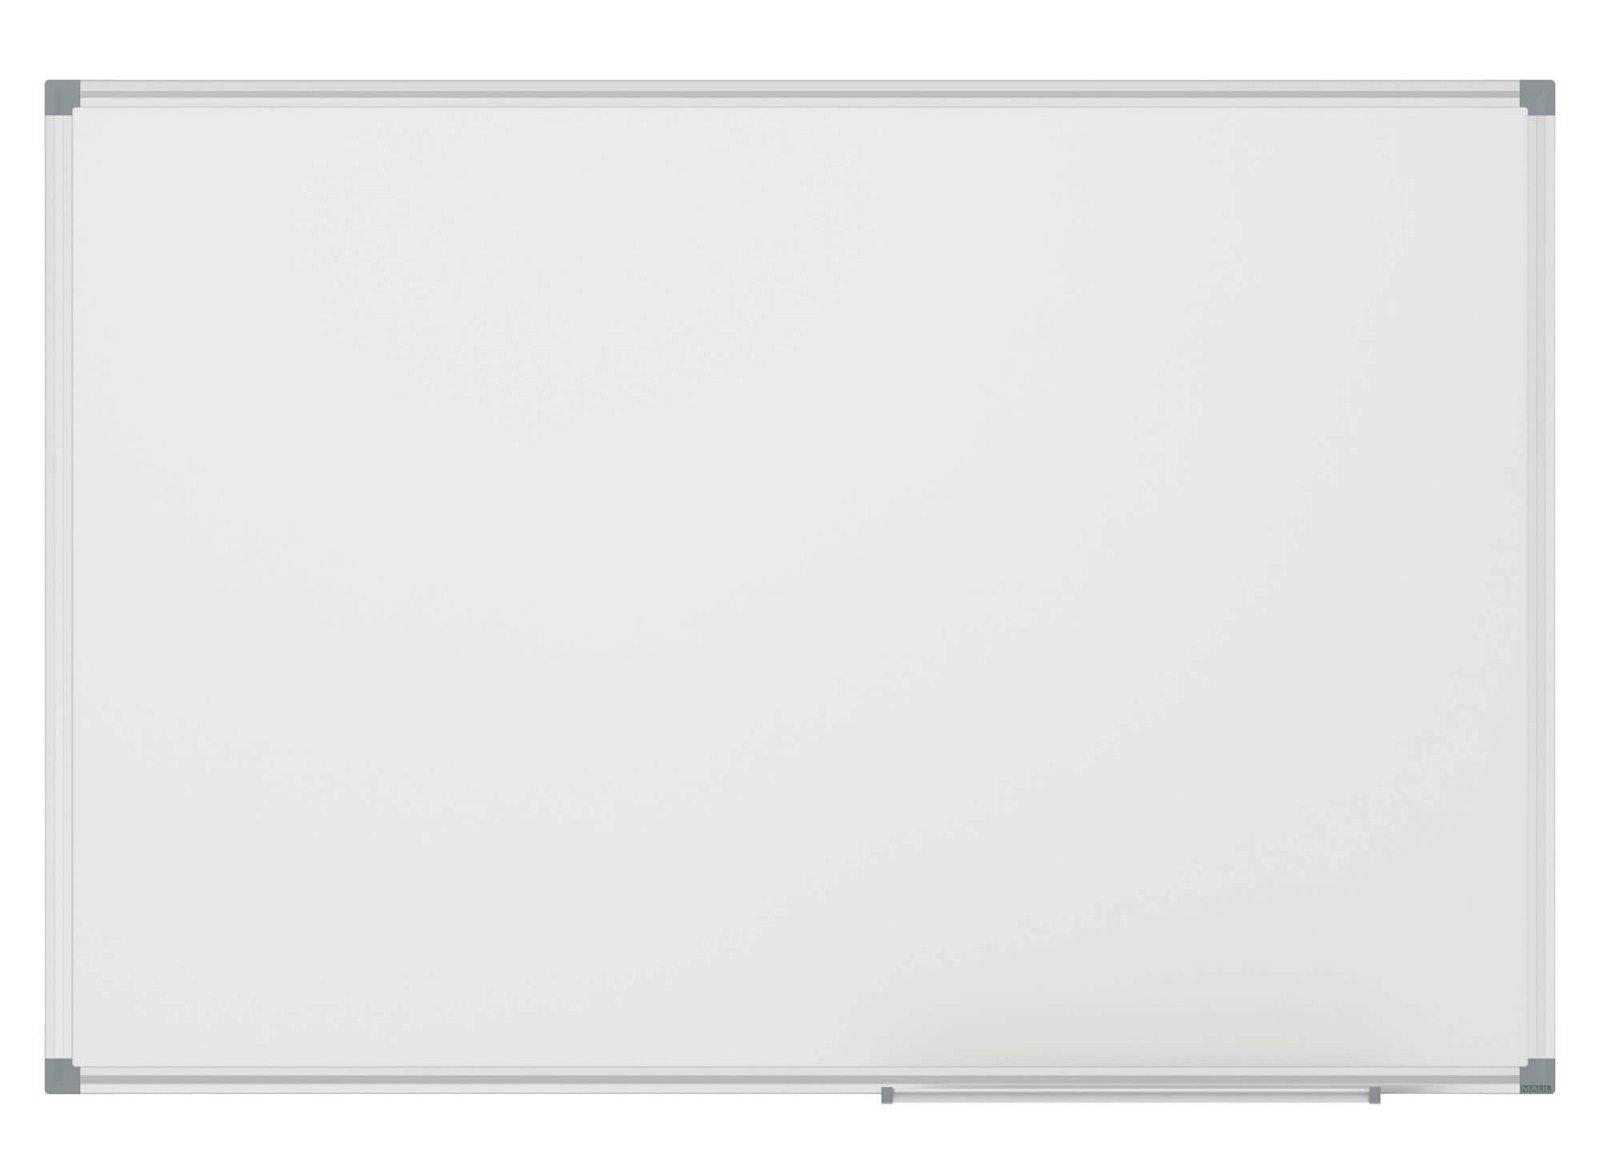 Whiteboard MAULstandard, 120x240 cm, grau